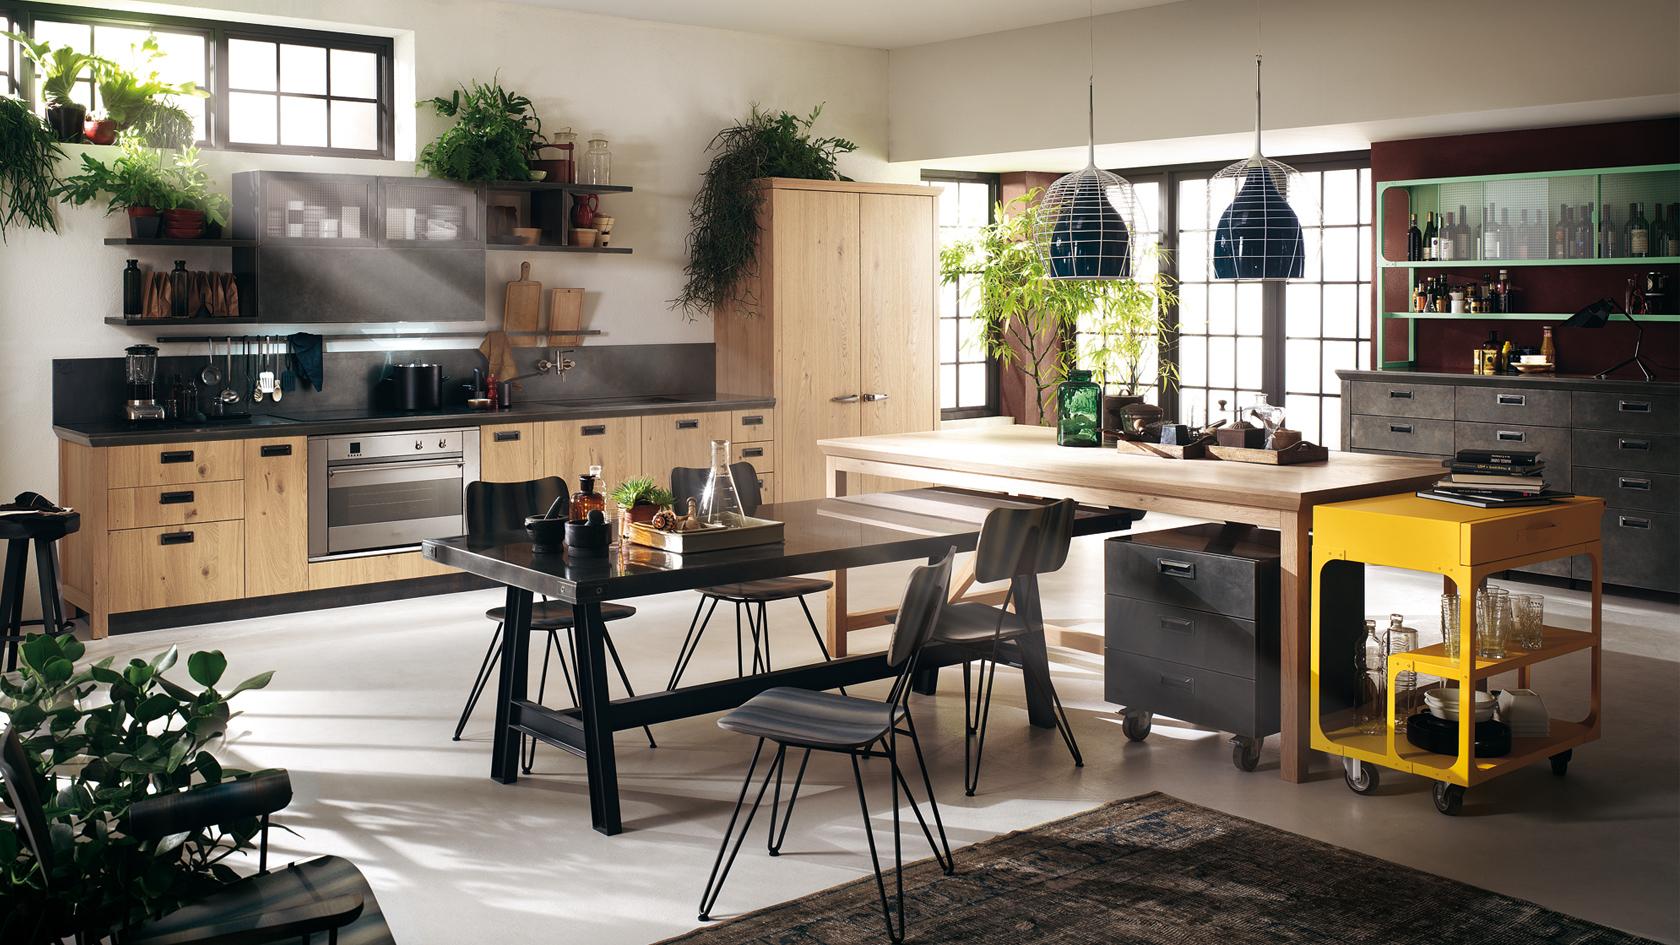 cucina Scavolini - Diesel Social Kitchen